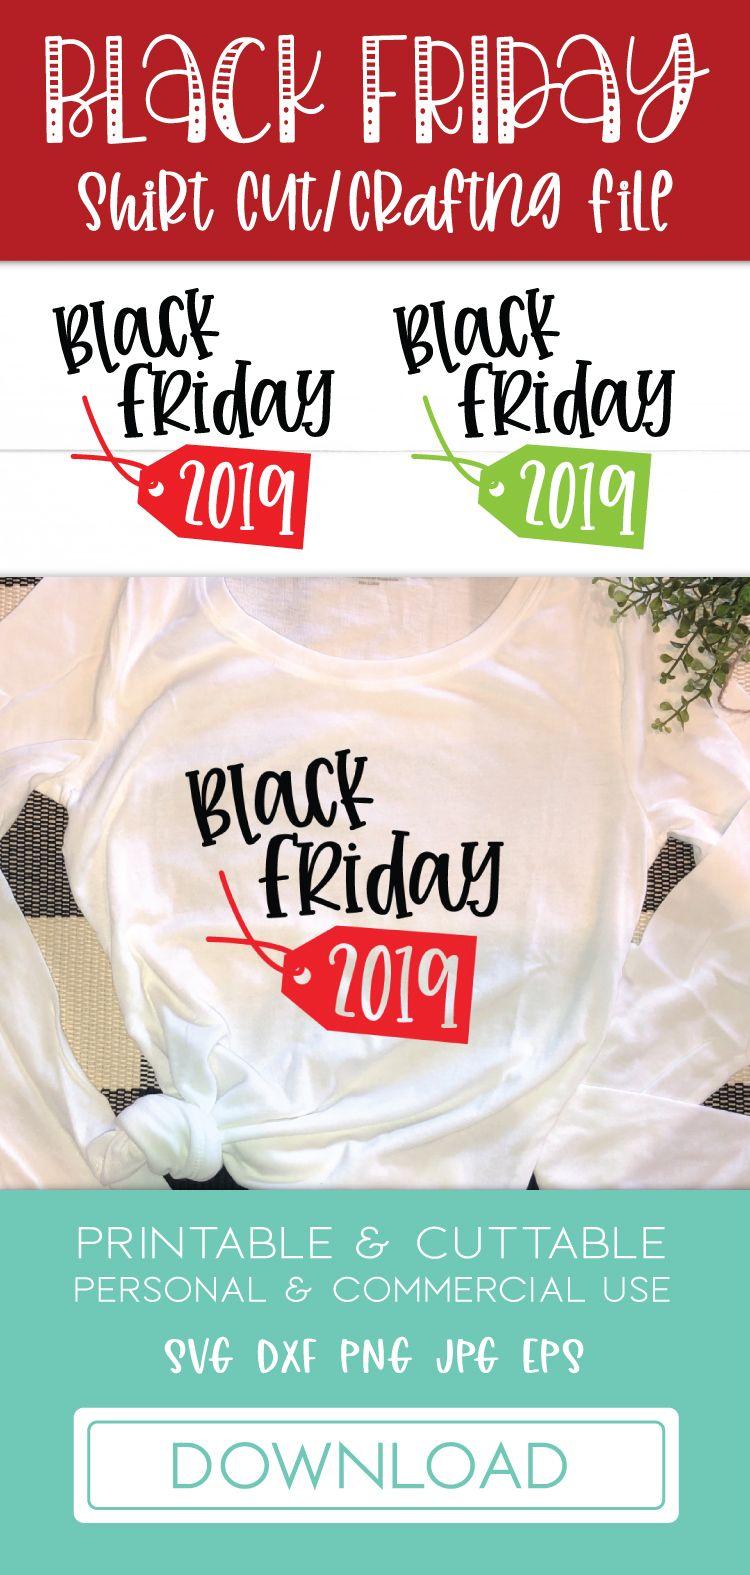 Black Friday 2019 SVG Cut File